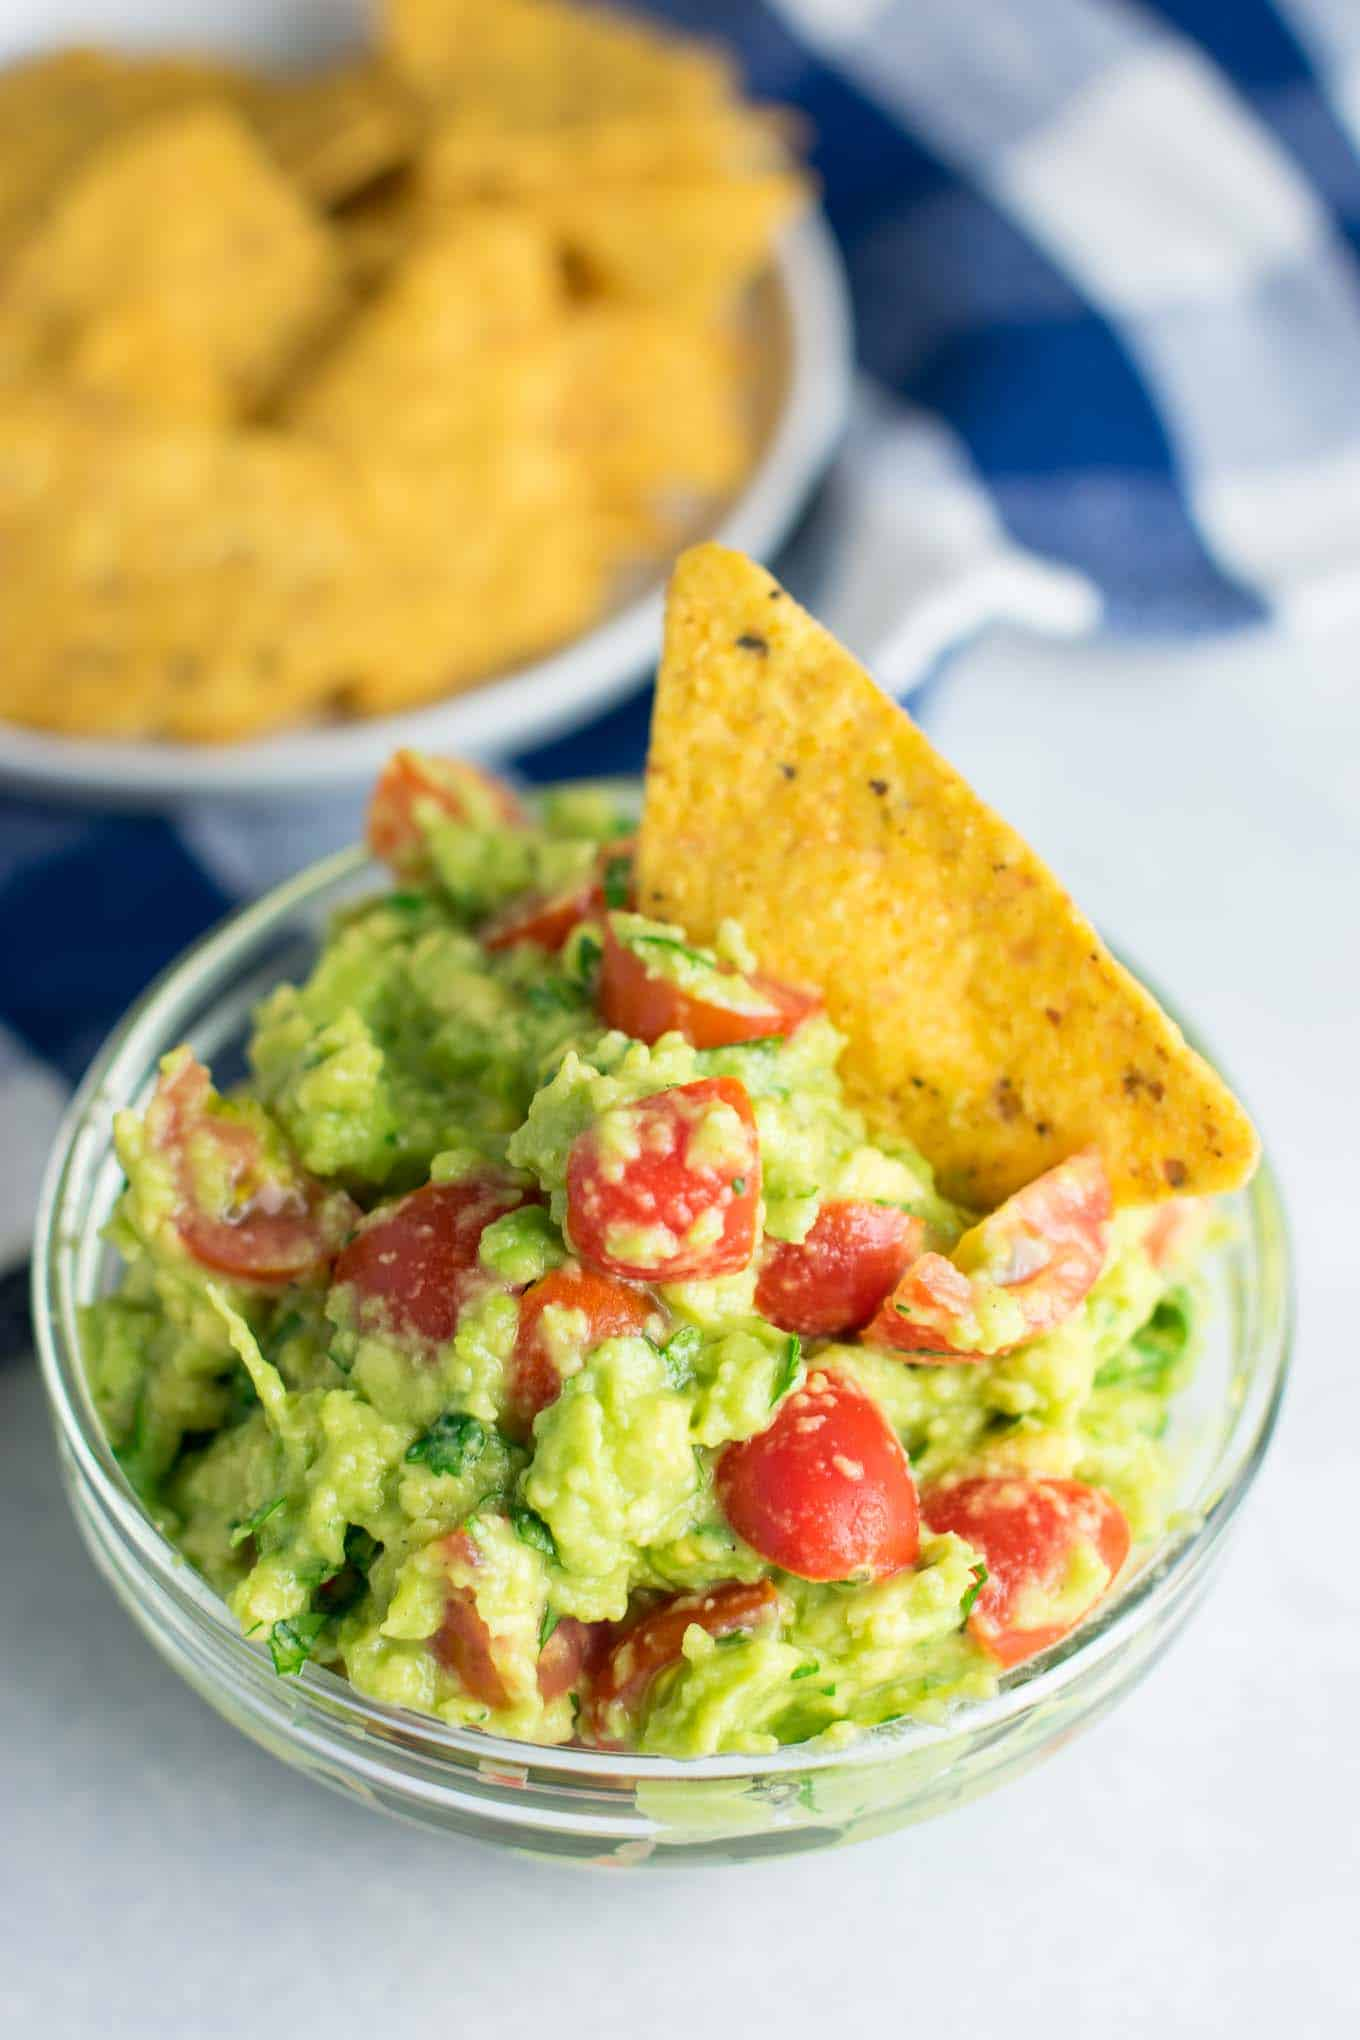 Healthy guacamole recipe with cherry tomatoes. #vegan #guacamole #bestguacamole #appetizers #gamedayfood